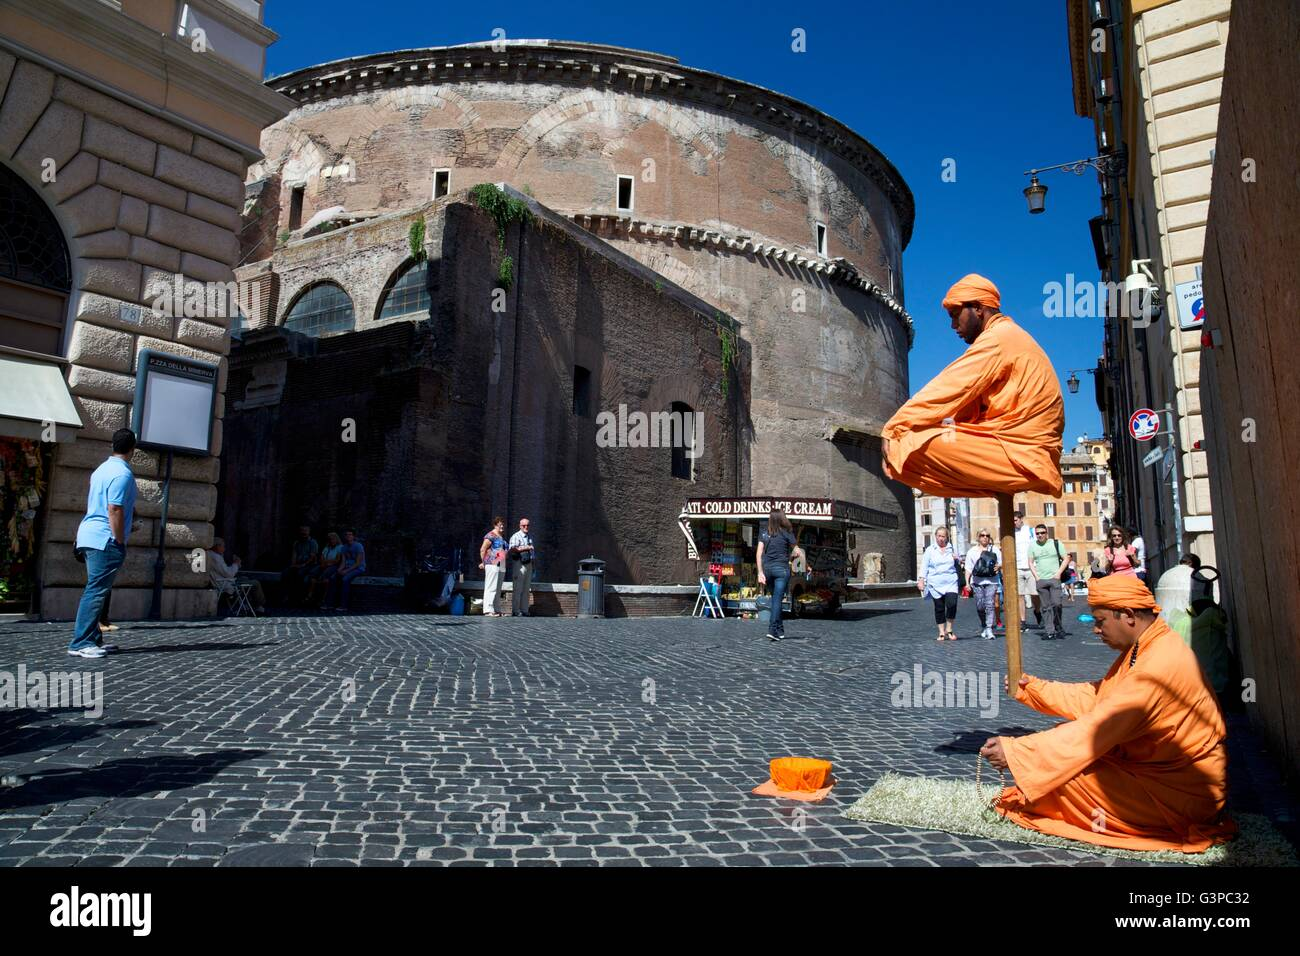 Levitating man street entertainers near Pantheon, Rome, Italy, Europe - Stock Image